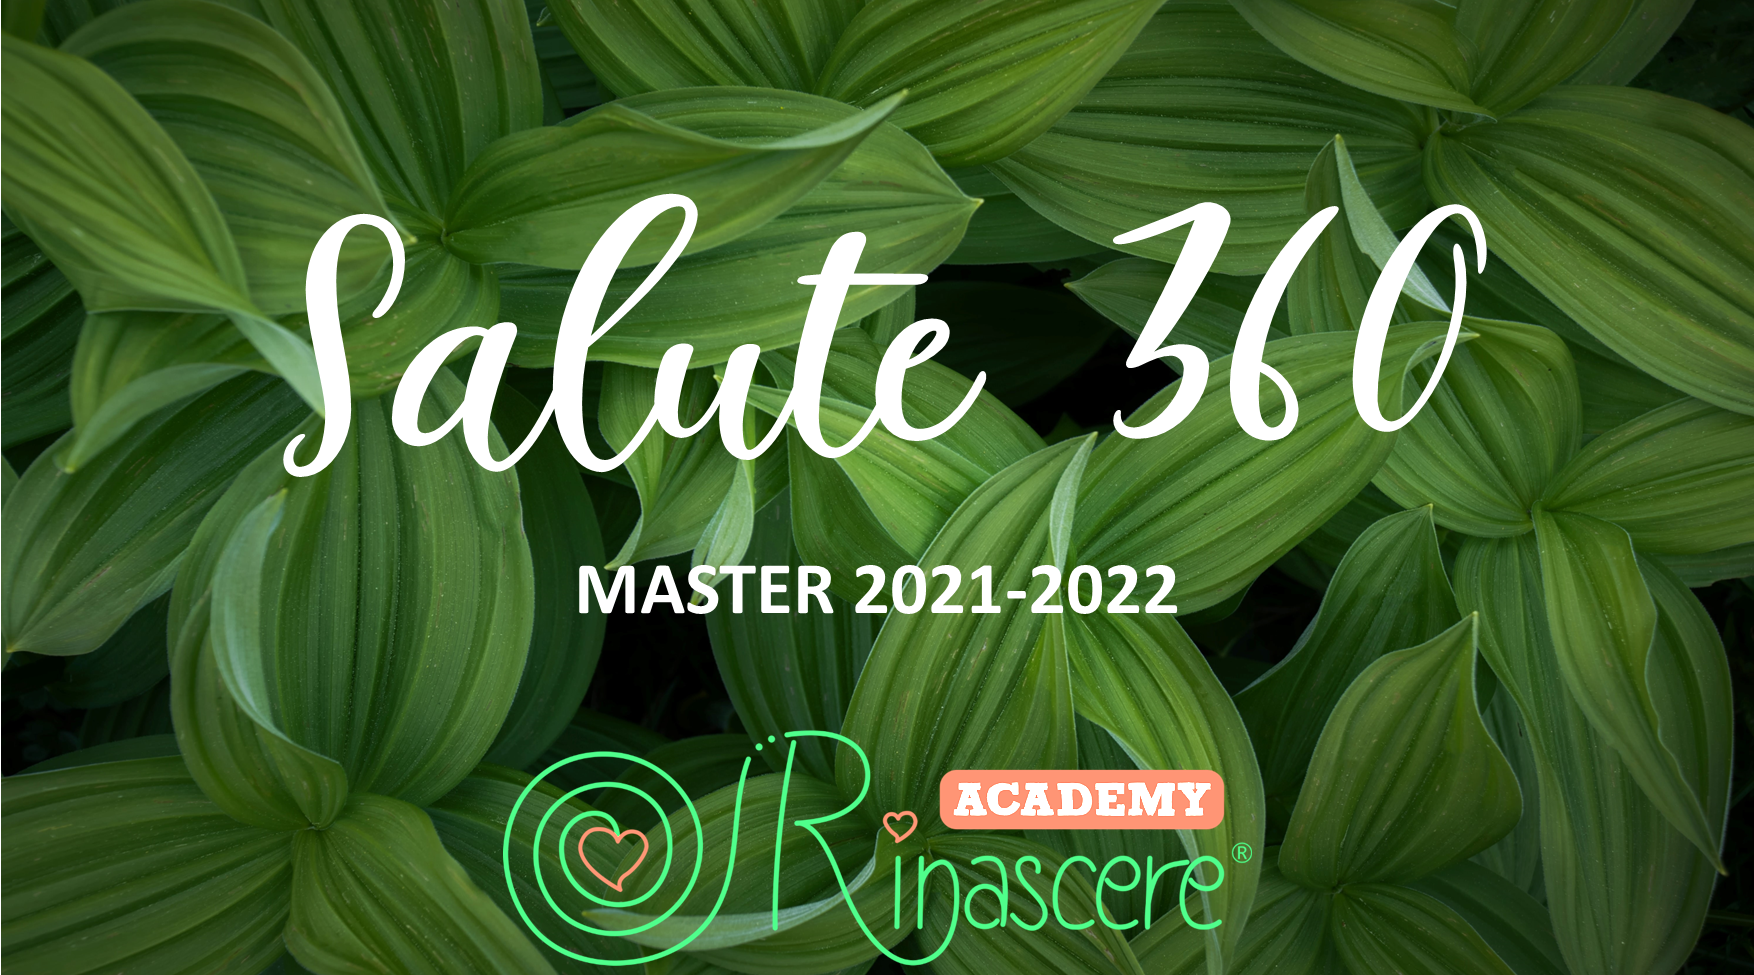 MASTER SALUTE 360